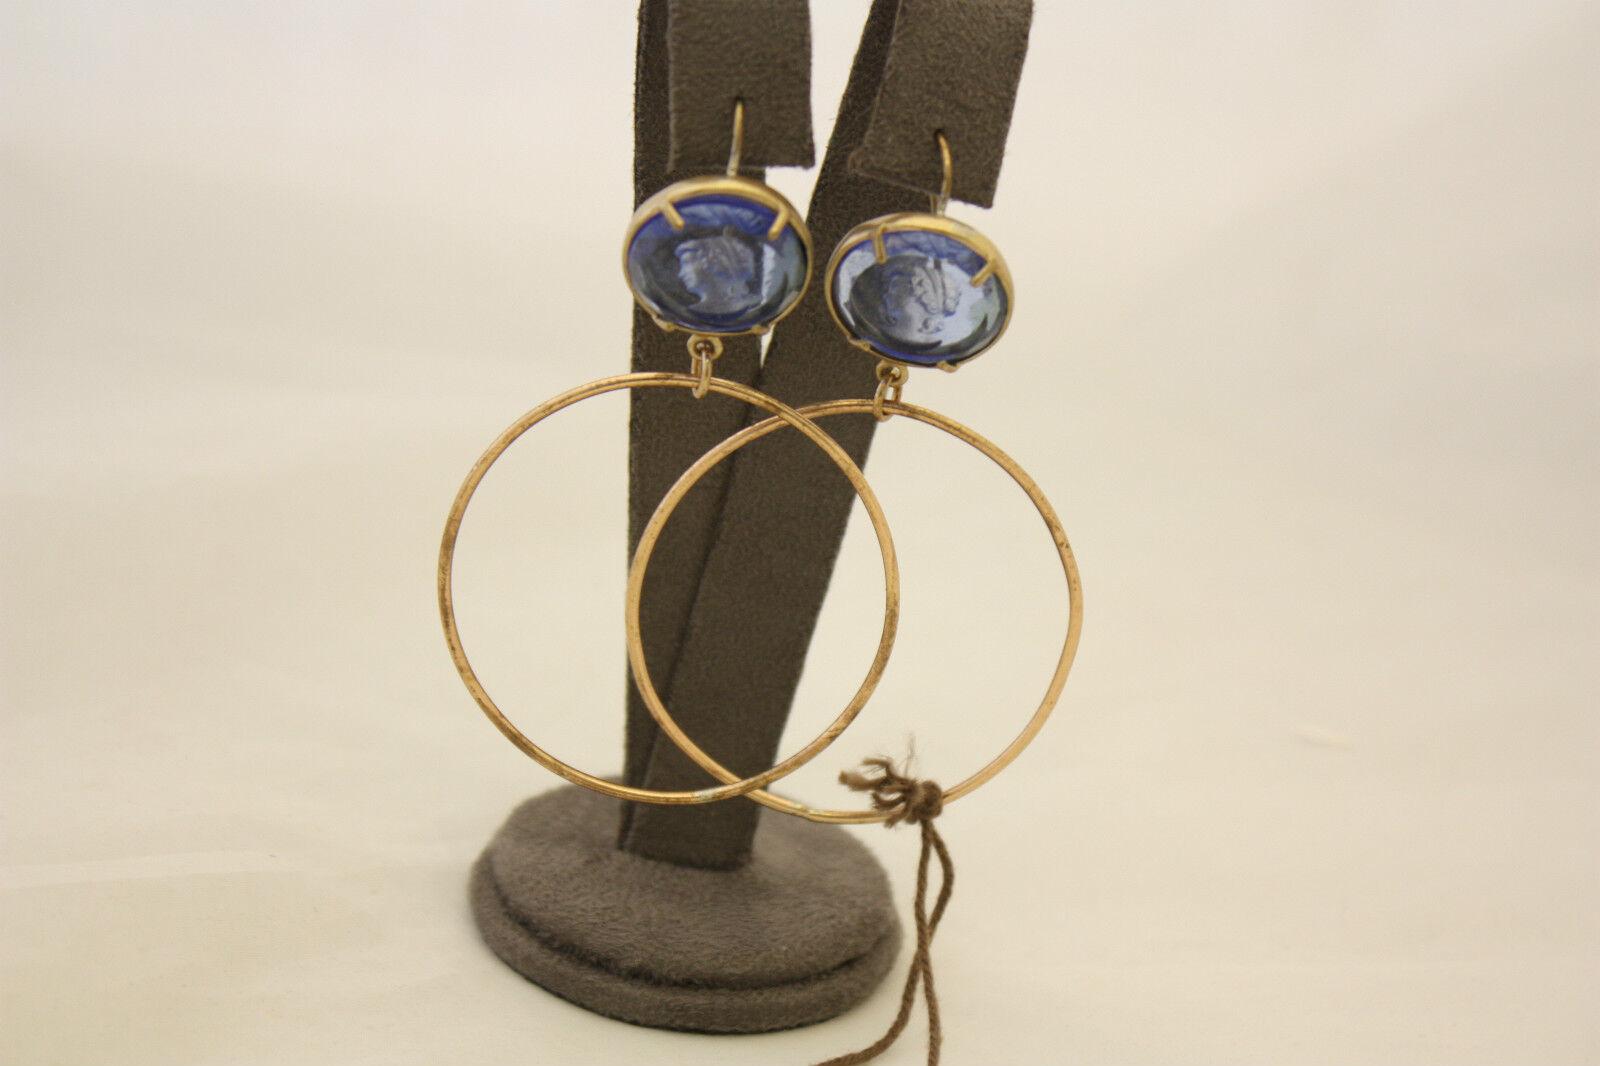 Hoop Earrings Patrizia Daliana Bronze pinkto with Cameo Glass bluee